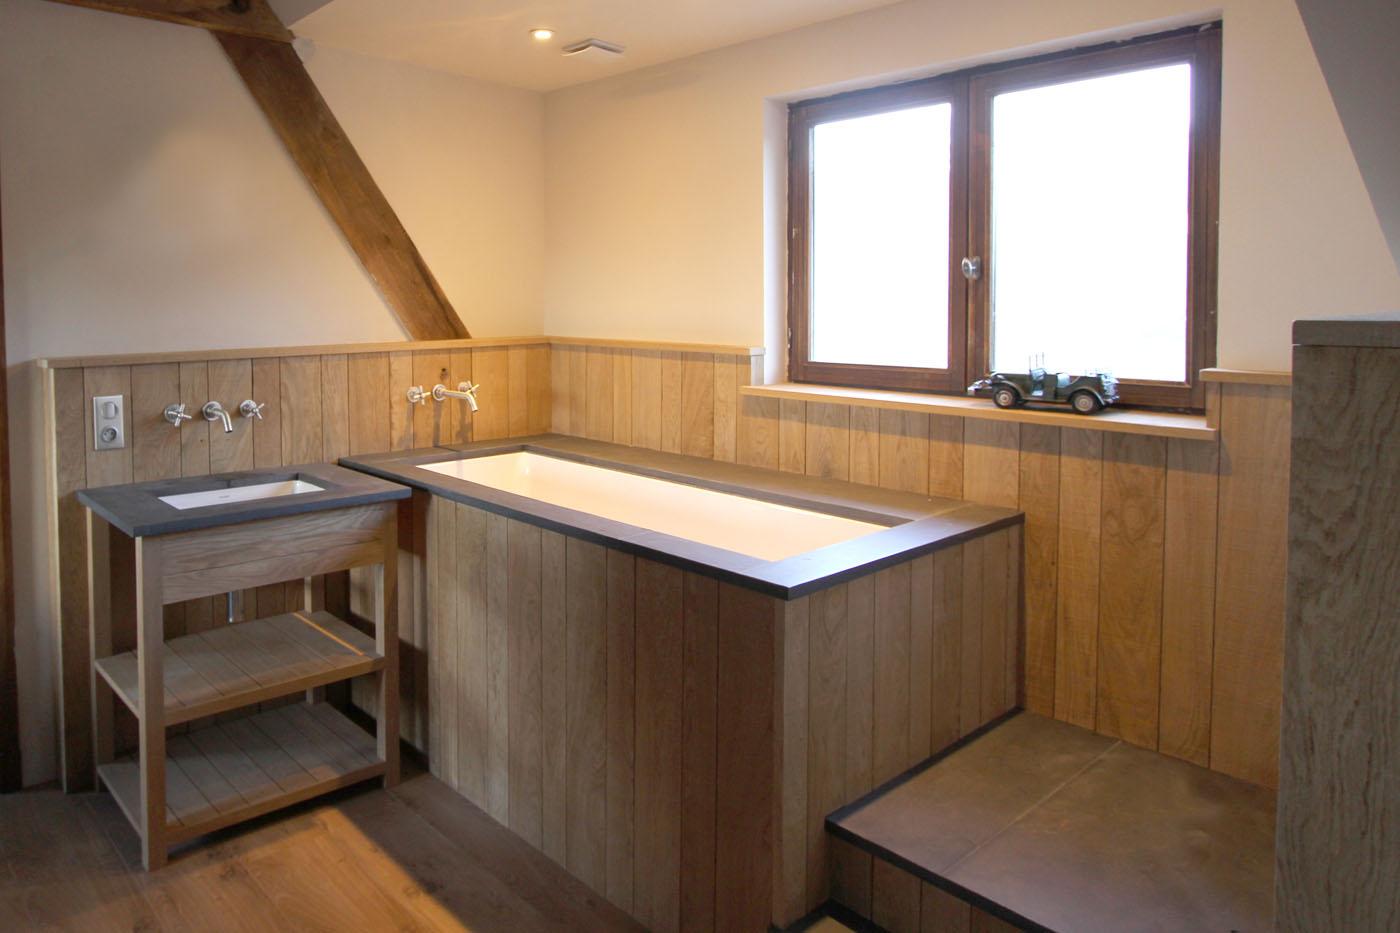 Chambre Ouverte Salle De Bain salle de bain sur mesure | barbara delaruelle - architecte d